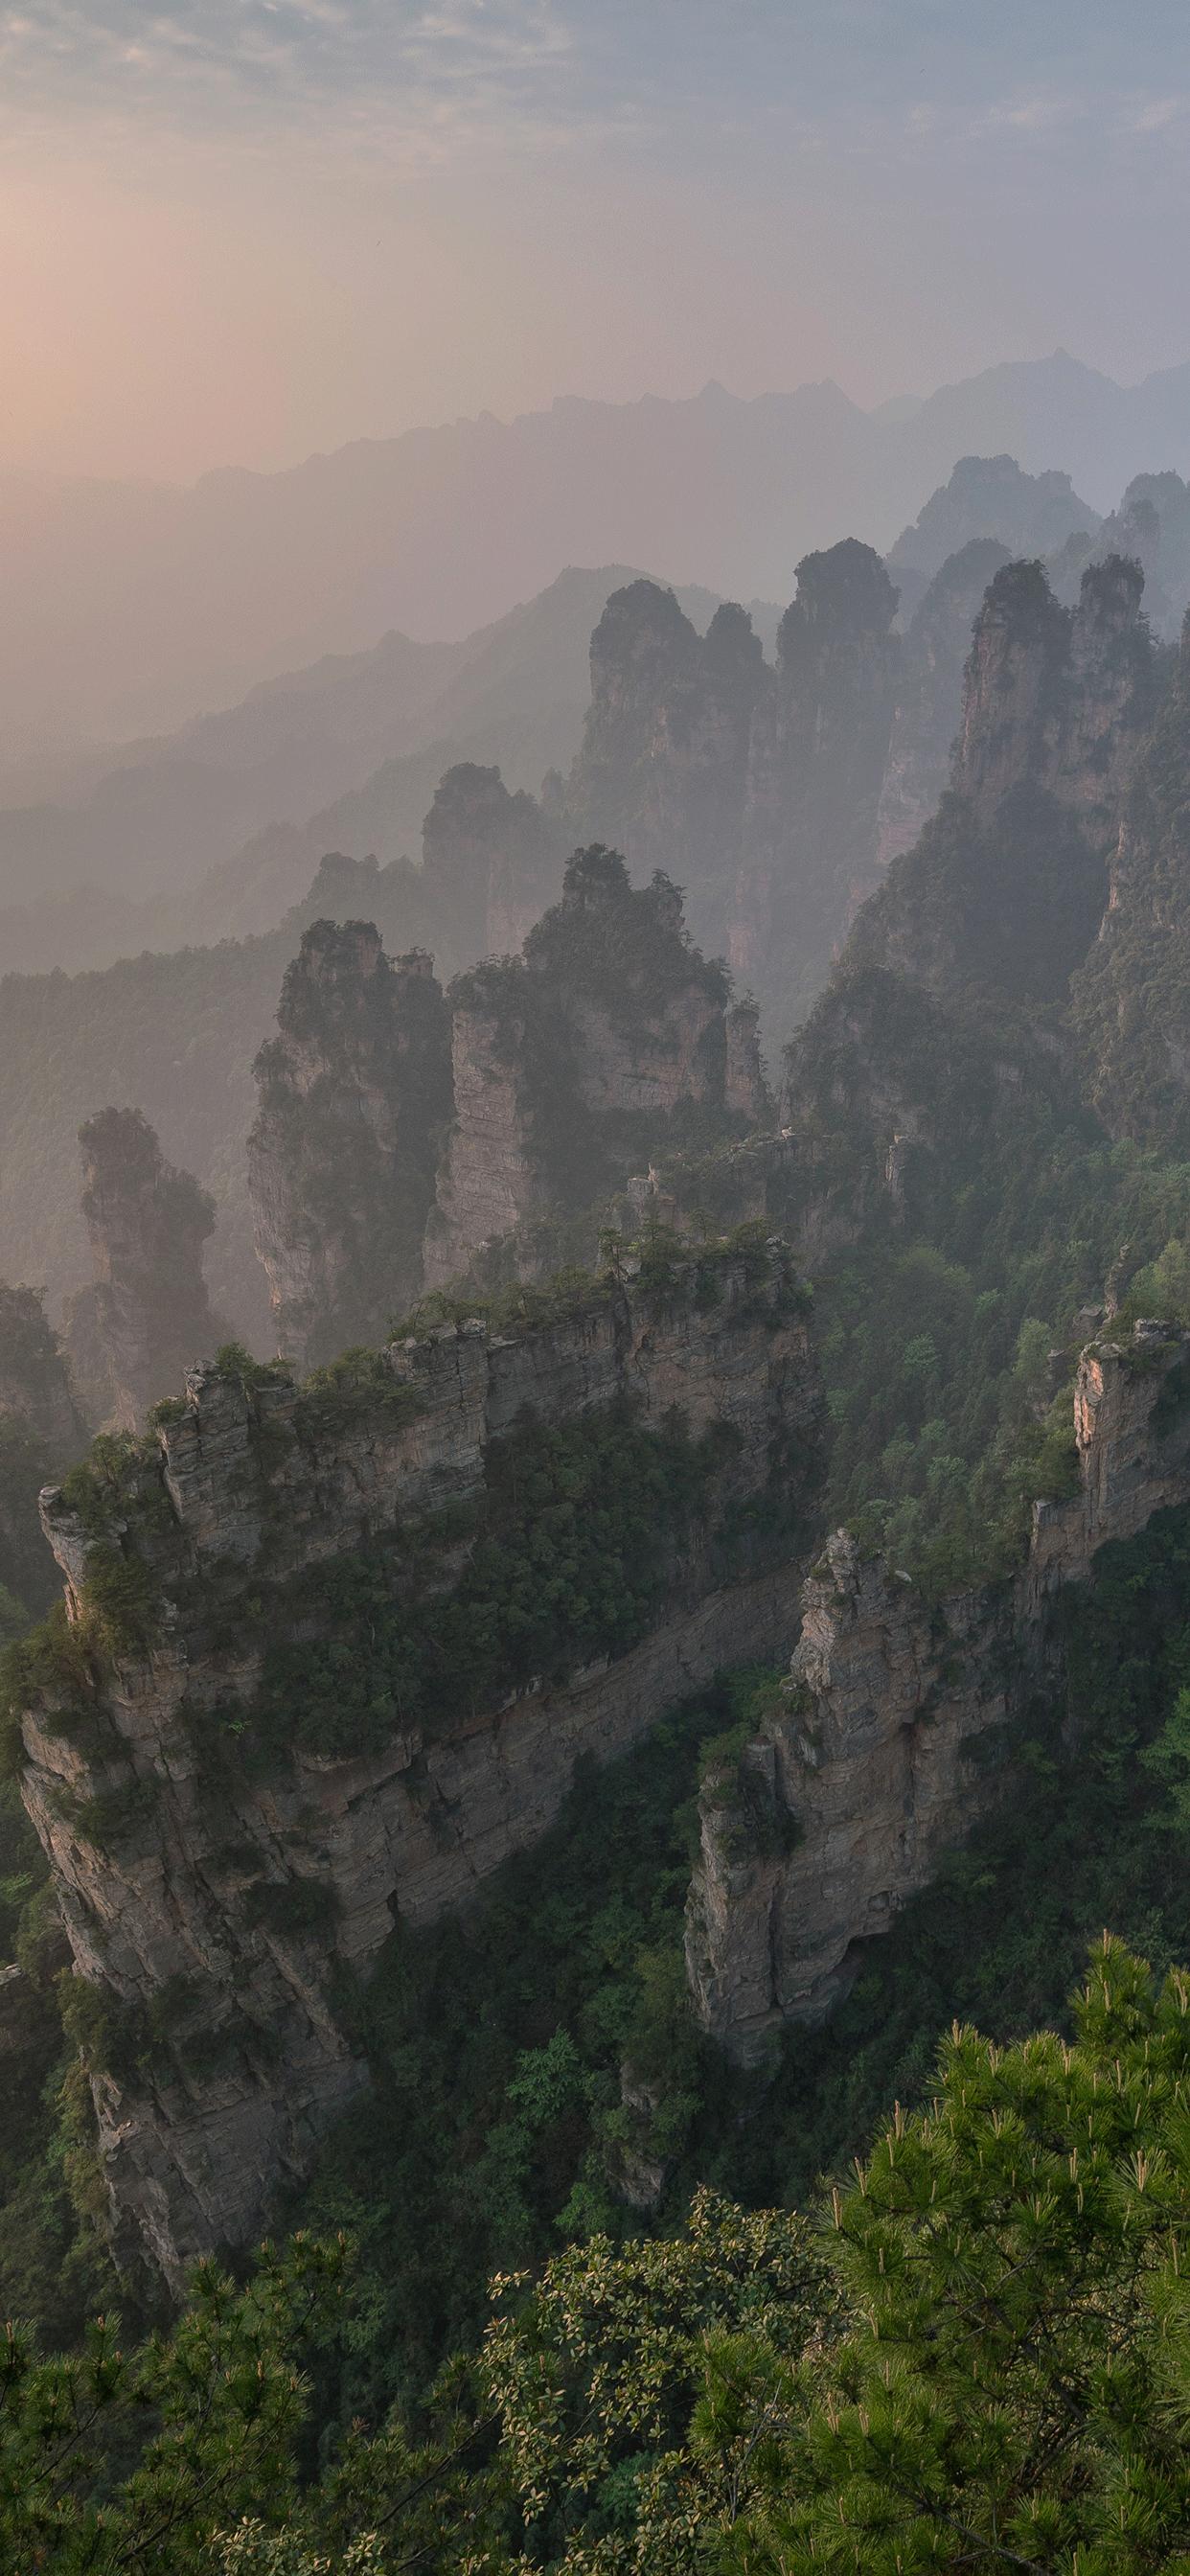 iPhone wallpapers zhangjiajie national park 2 ZhangJiaJie National Park